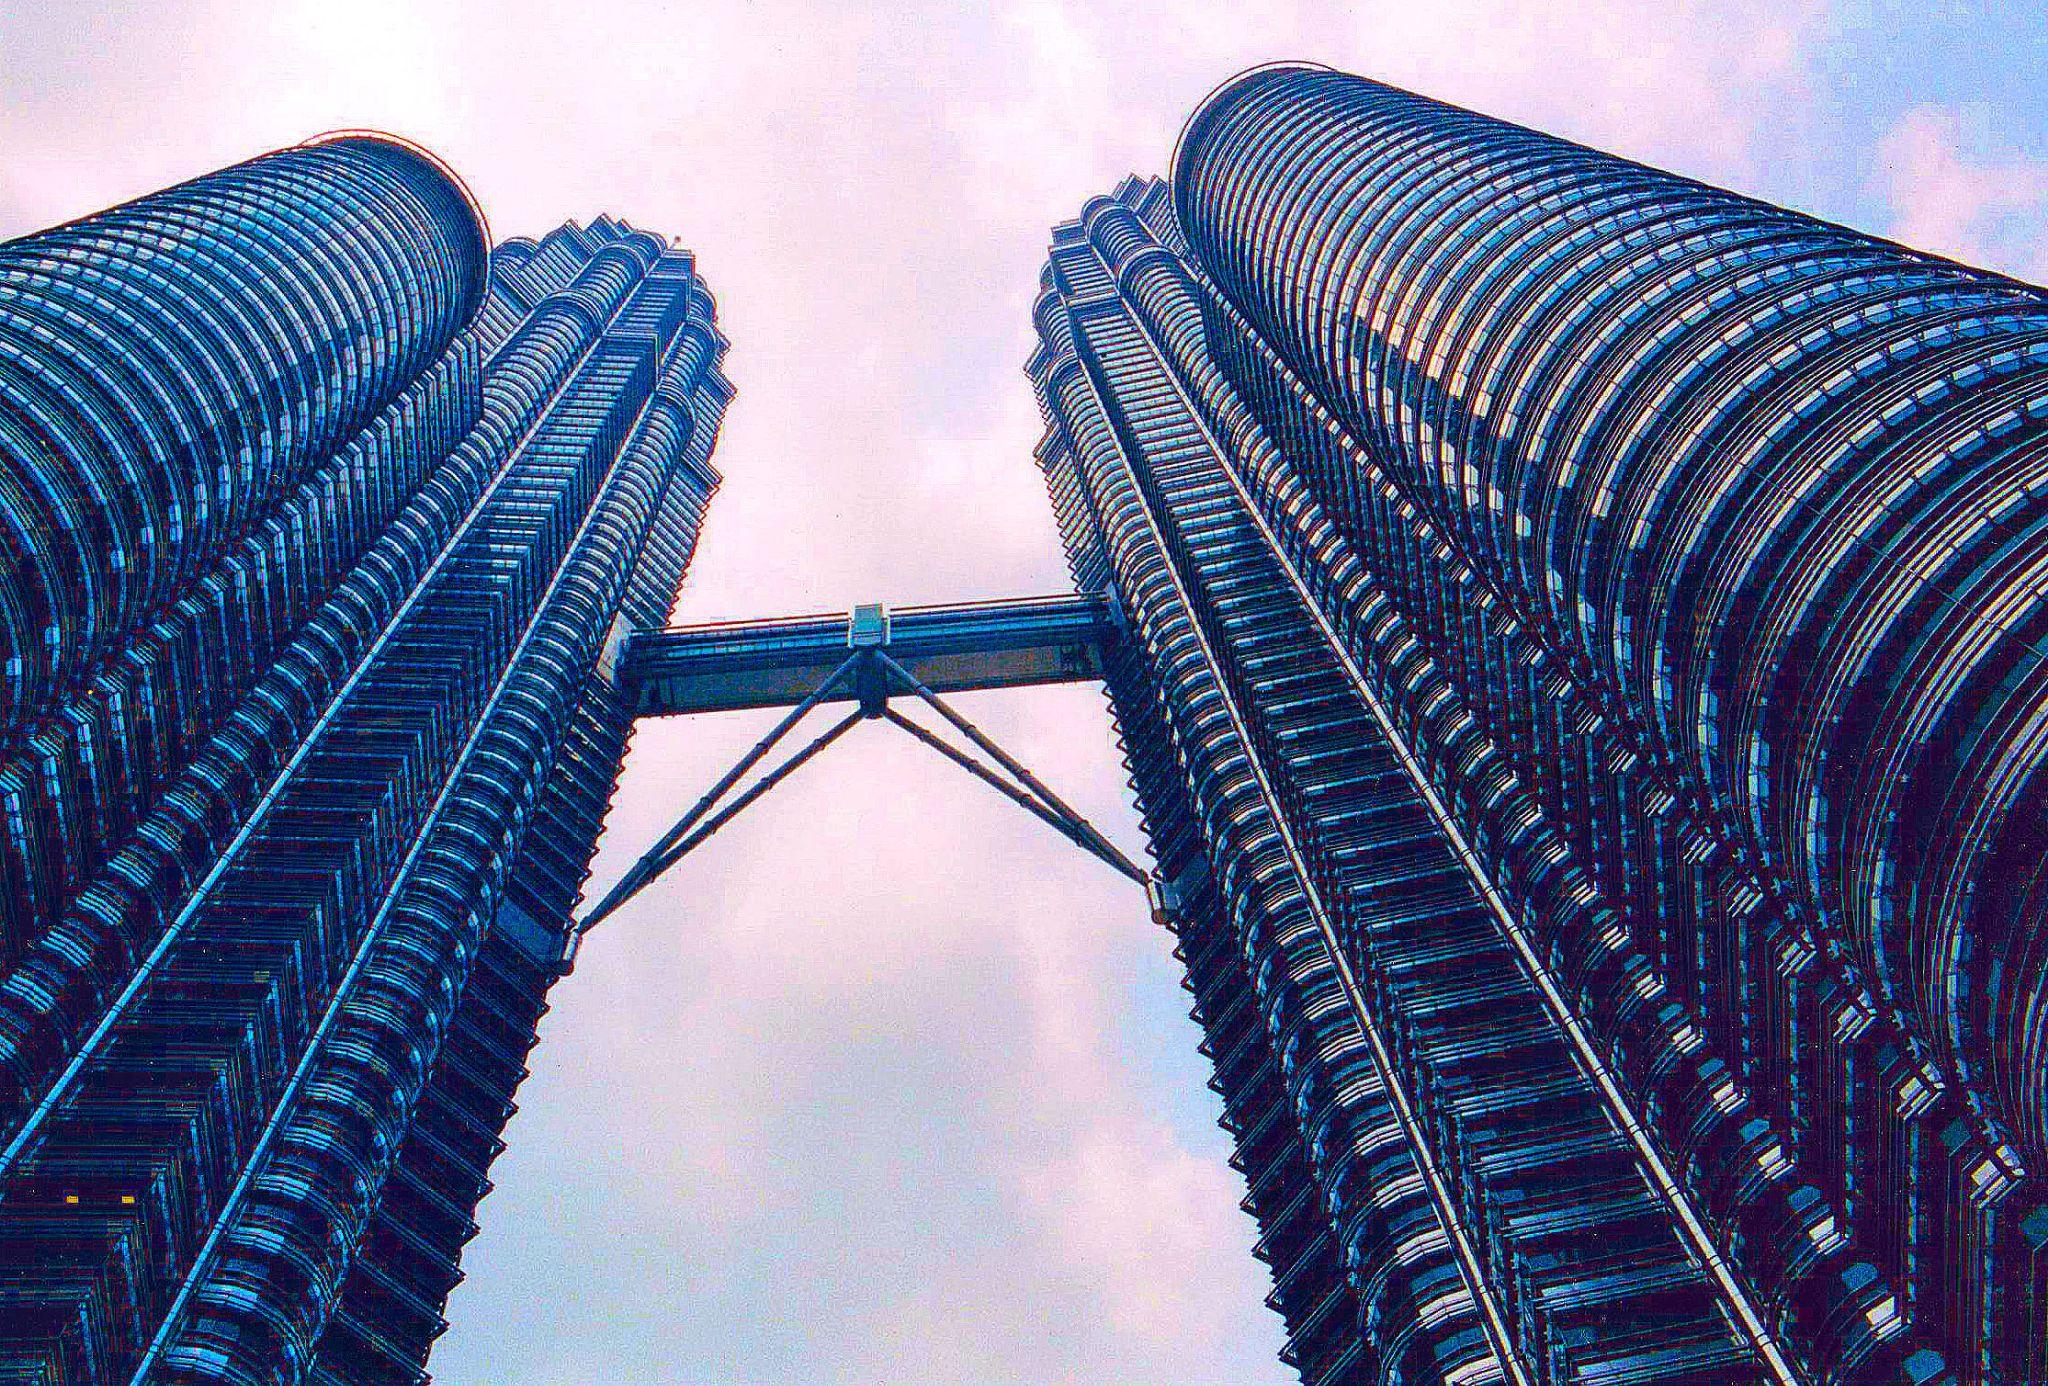 Petronas Towers by RusselWinterflood